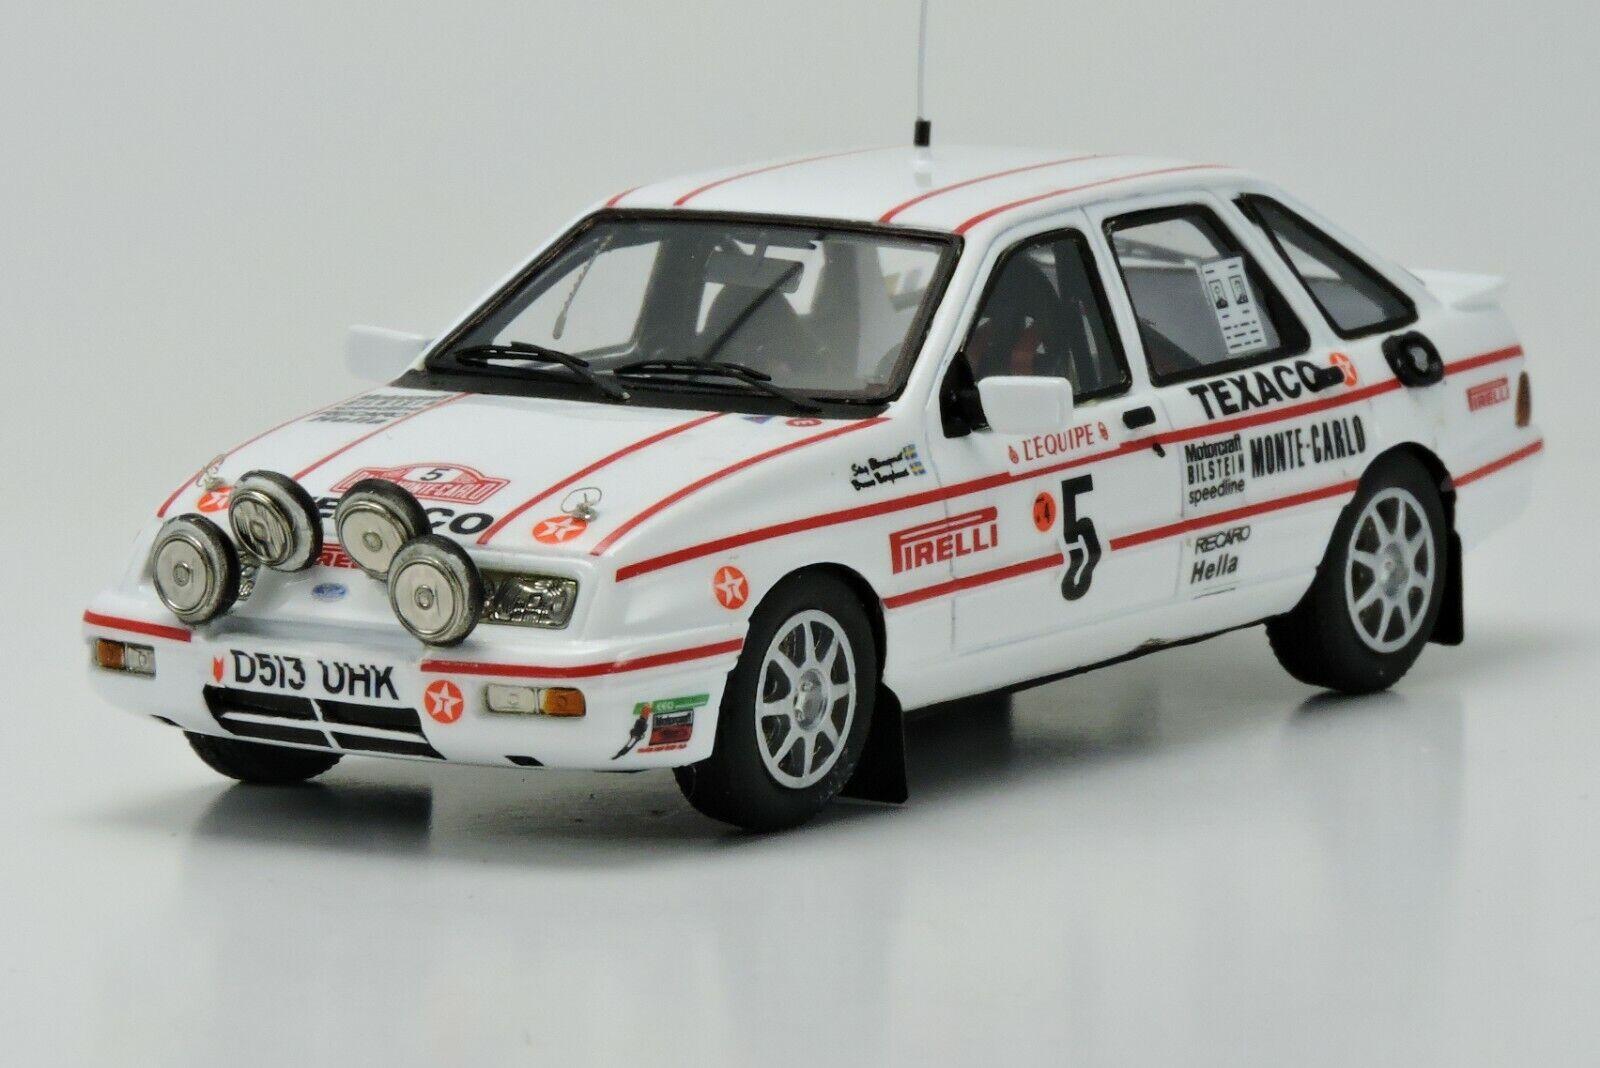 sconto Kit Ford Sierra Xri Xri Xri 4X4  5 Rtuttiy Monteautolo 1987 - Arena modellos kit 1 43  i nuovi stili più caldi